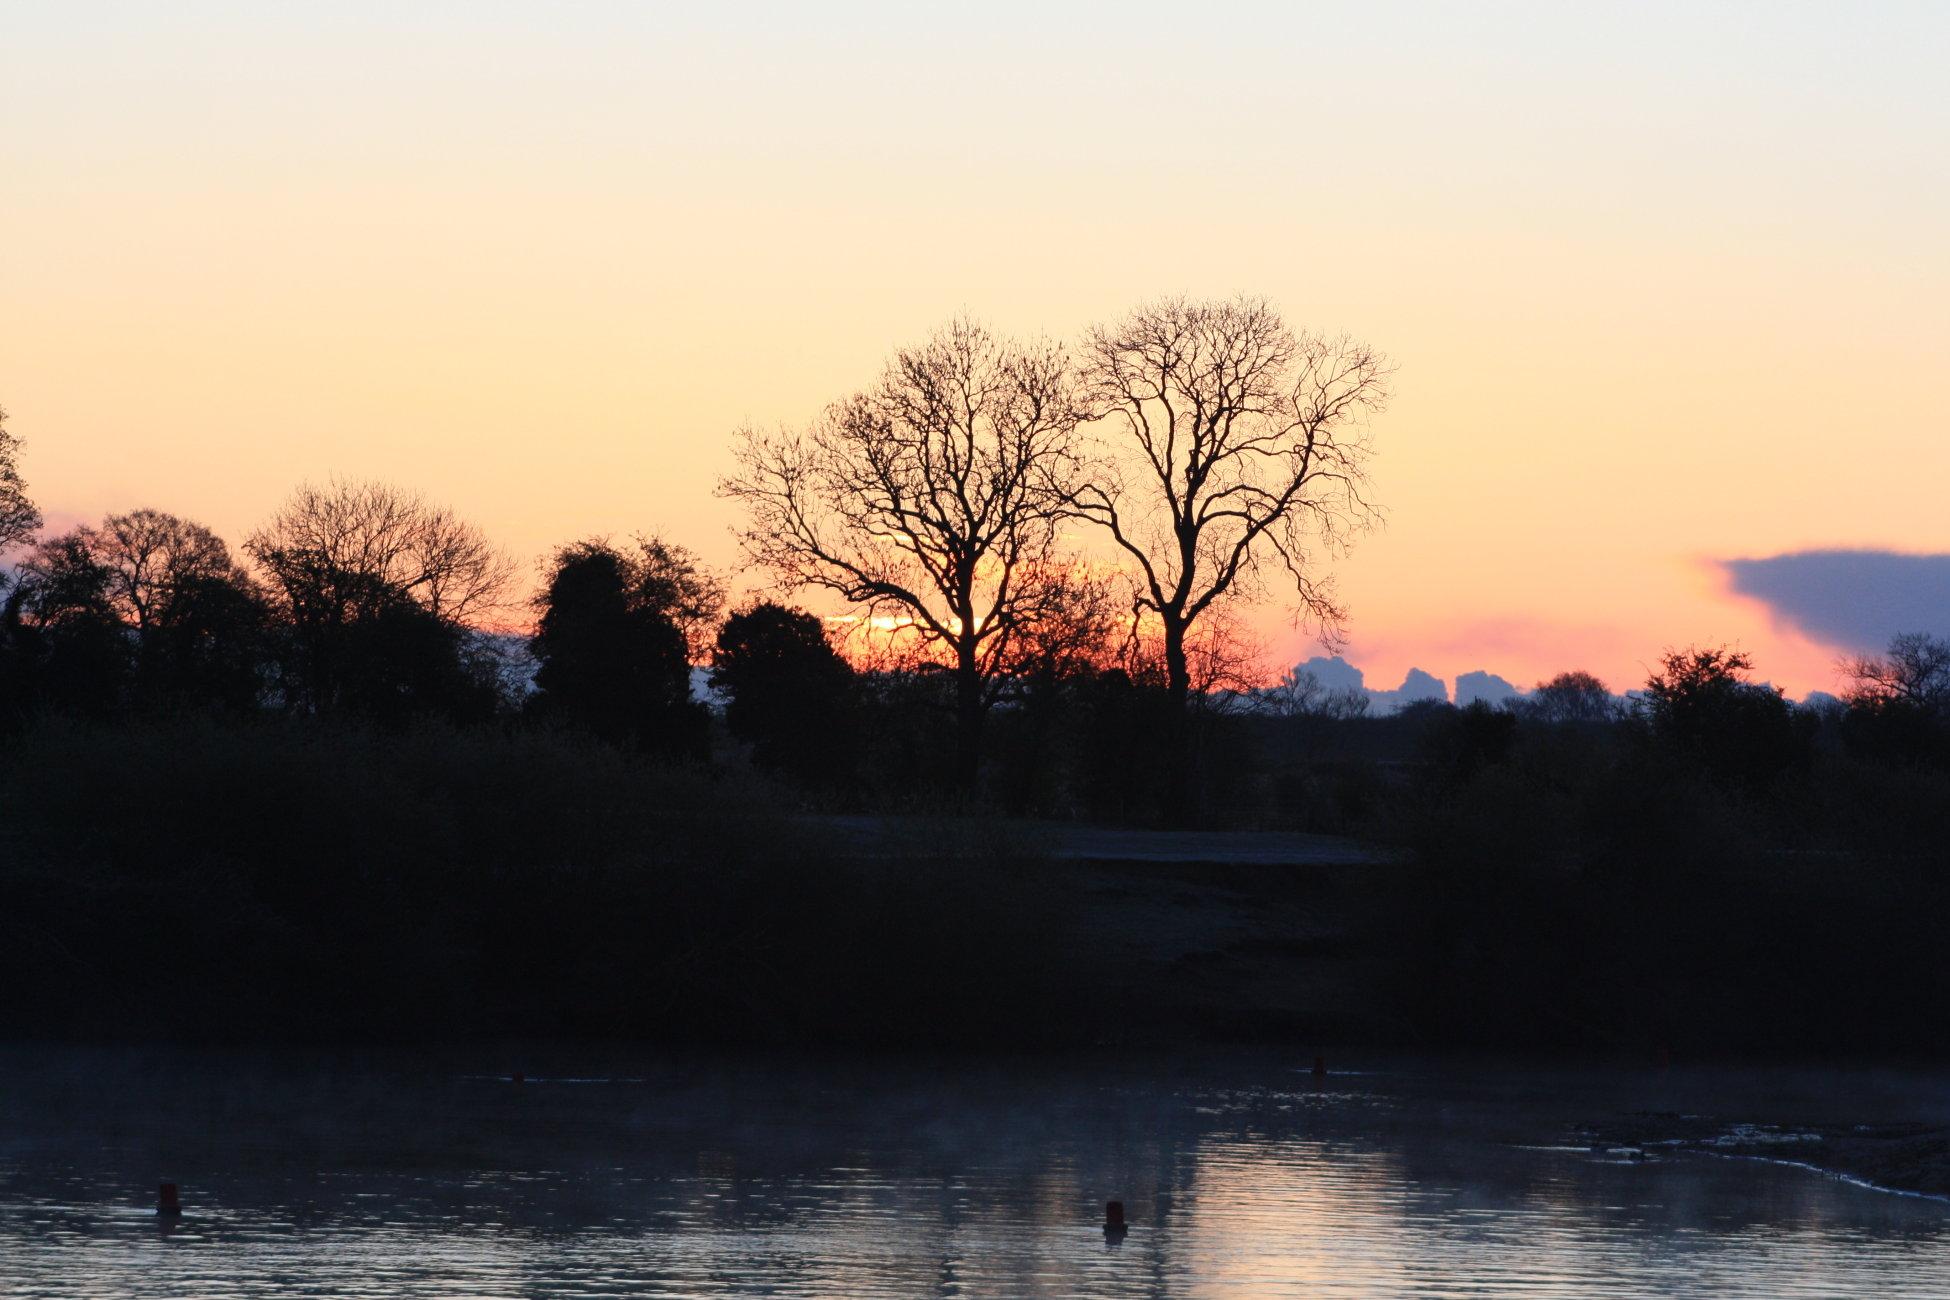 Sunrise over Linton Lock